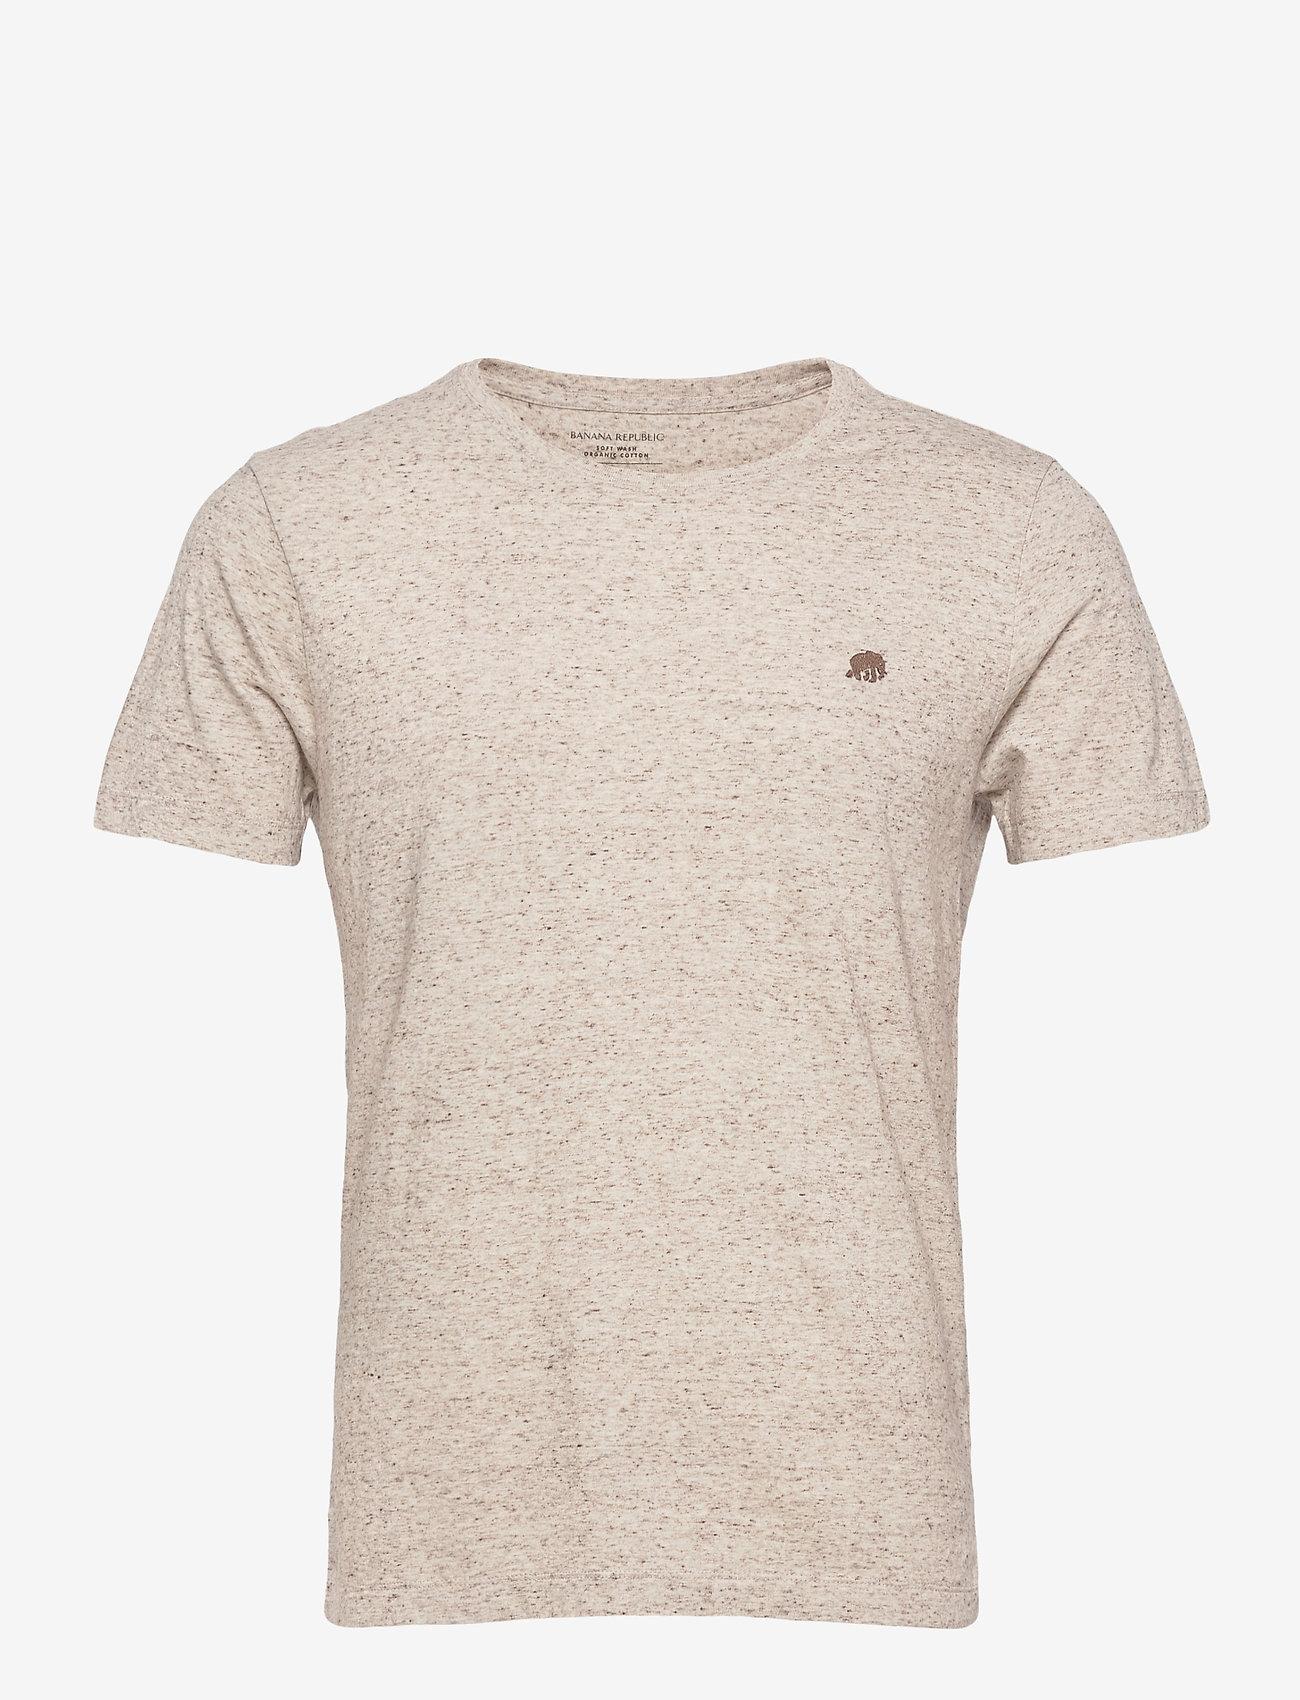 Banana Republic - I LOGO SOFTWASH ORGANIC TEE - basic t-shirts - oatmeal htr b0279 - 0